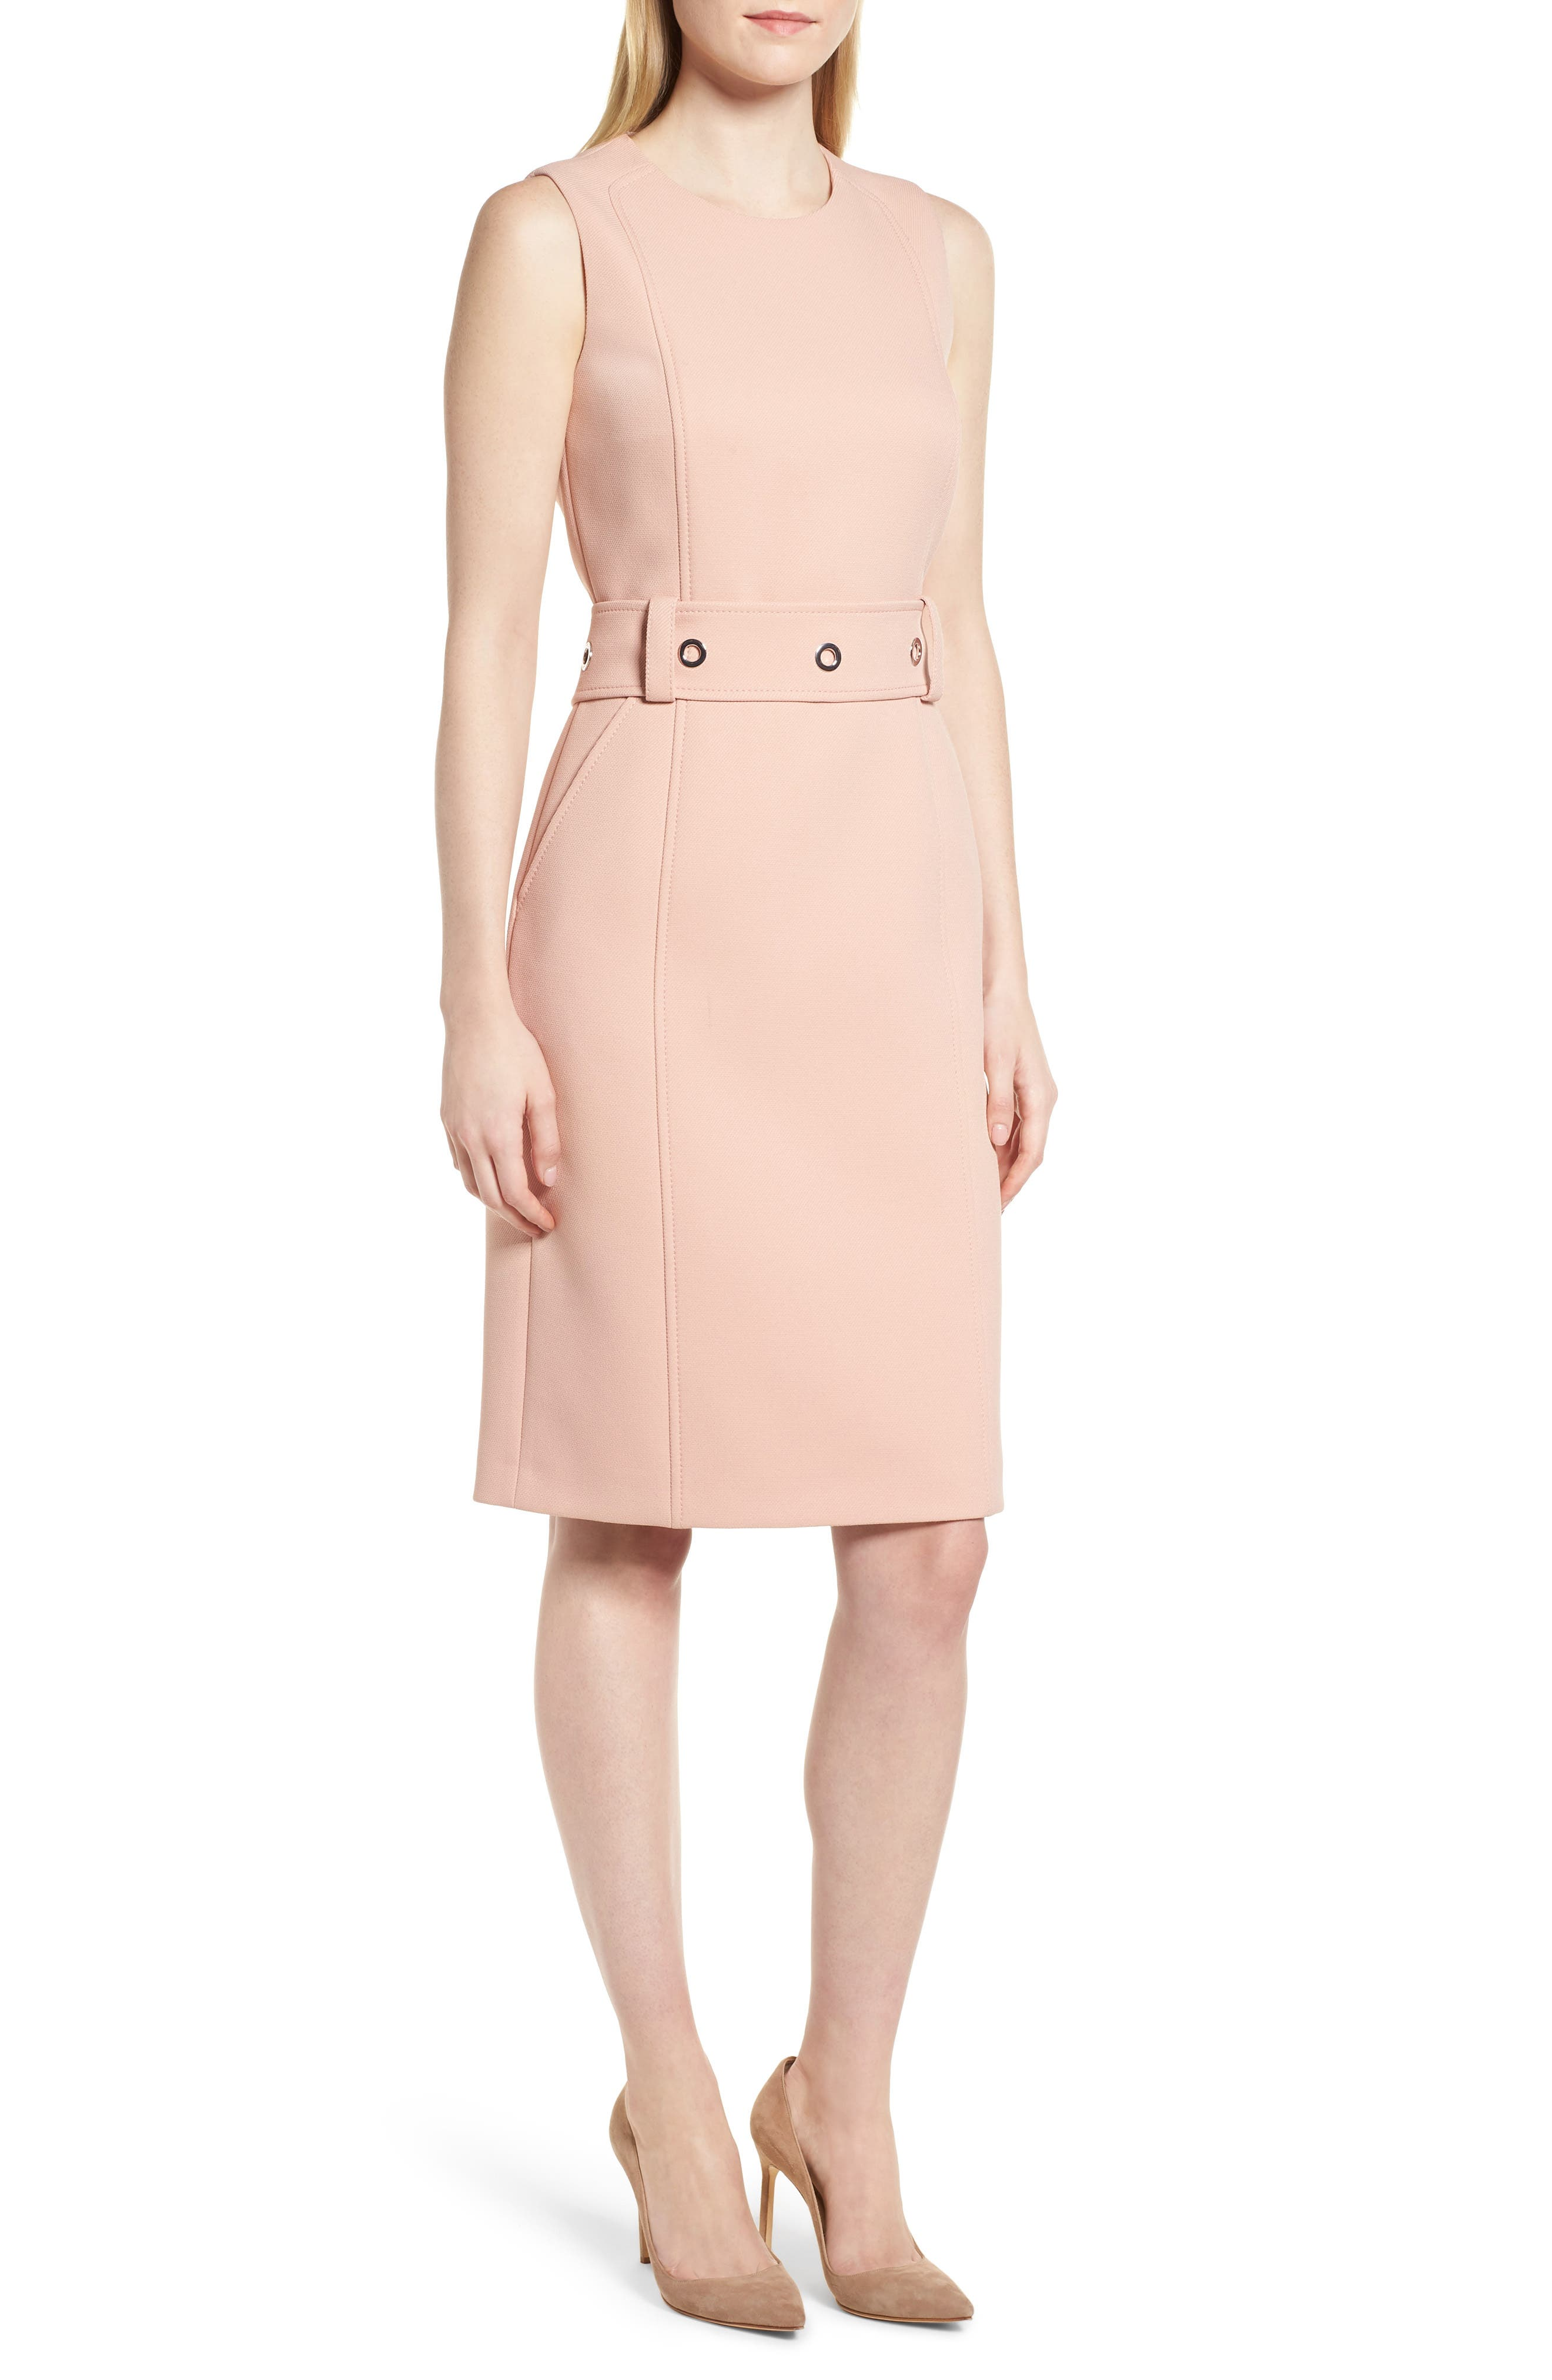 Duleama Compact Twill Dress,                         Main,                         color, Blush